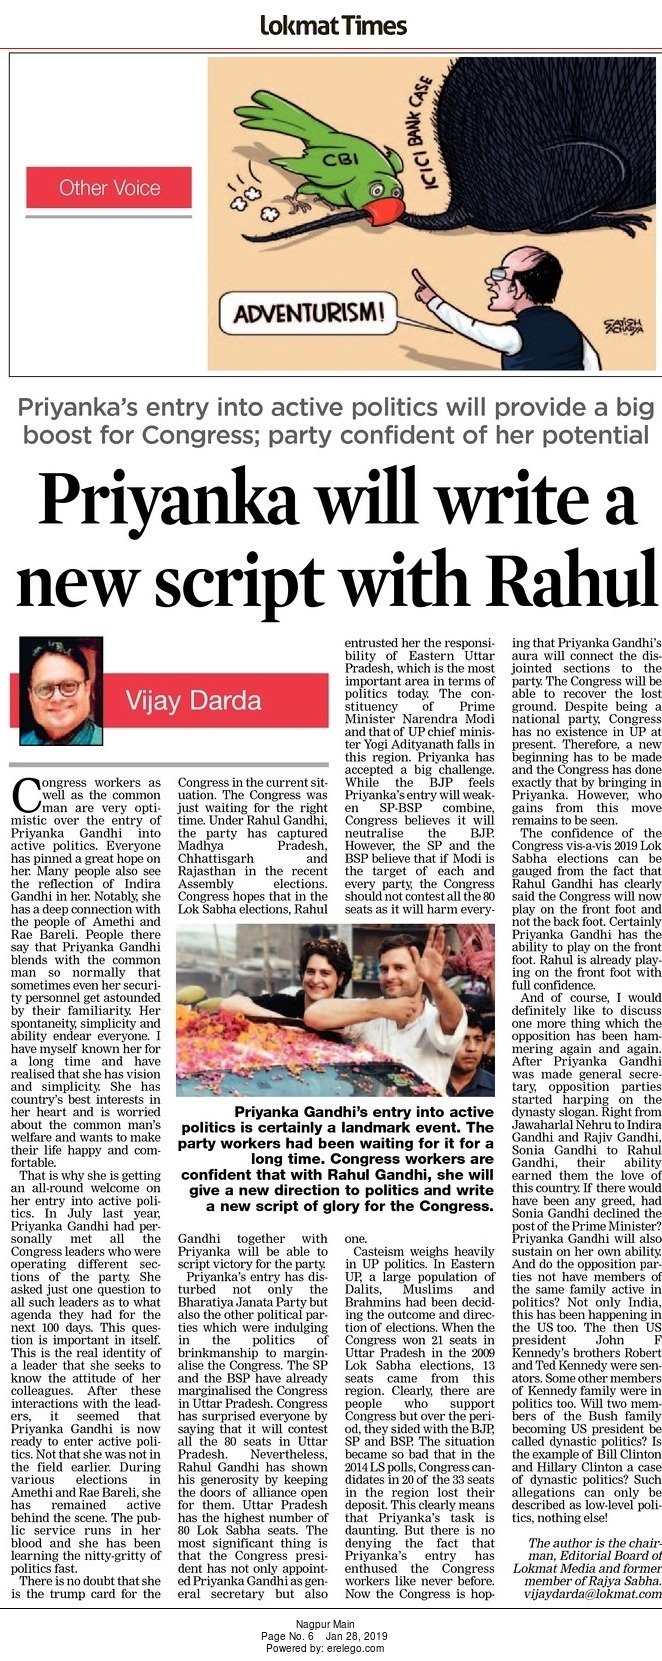 Priyanka will write a new script with Rahul